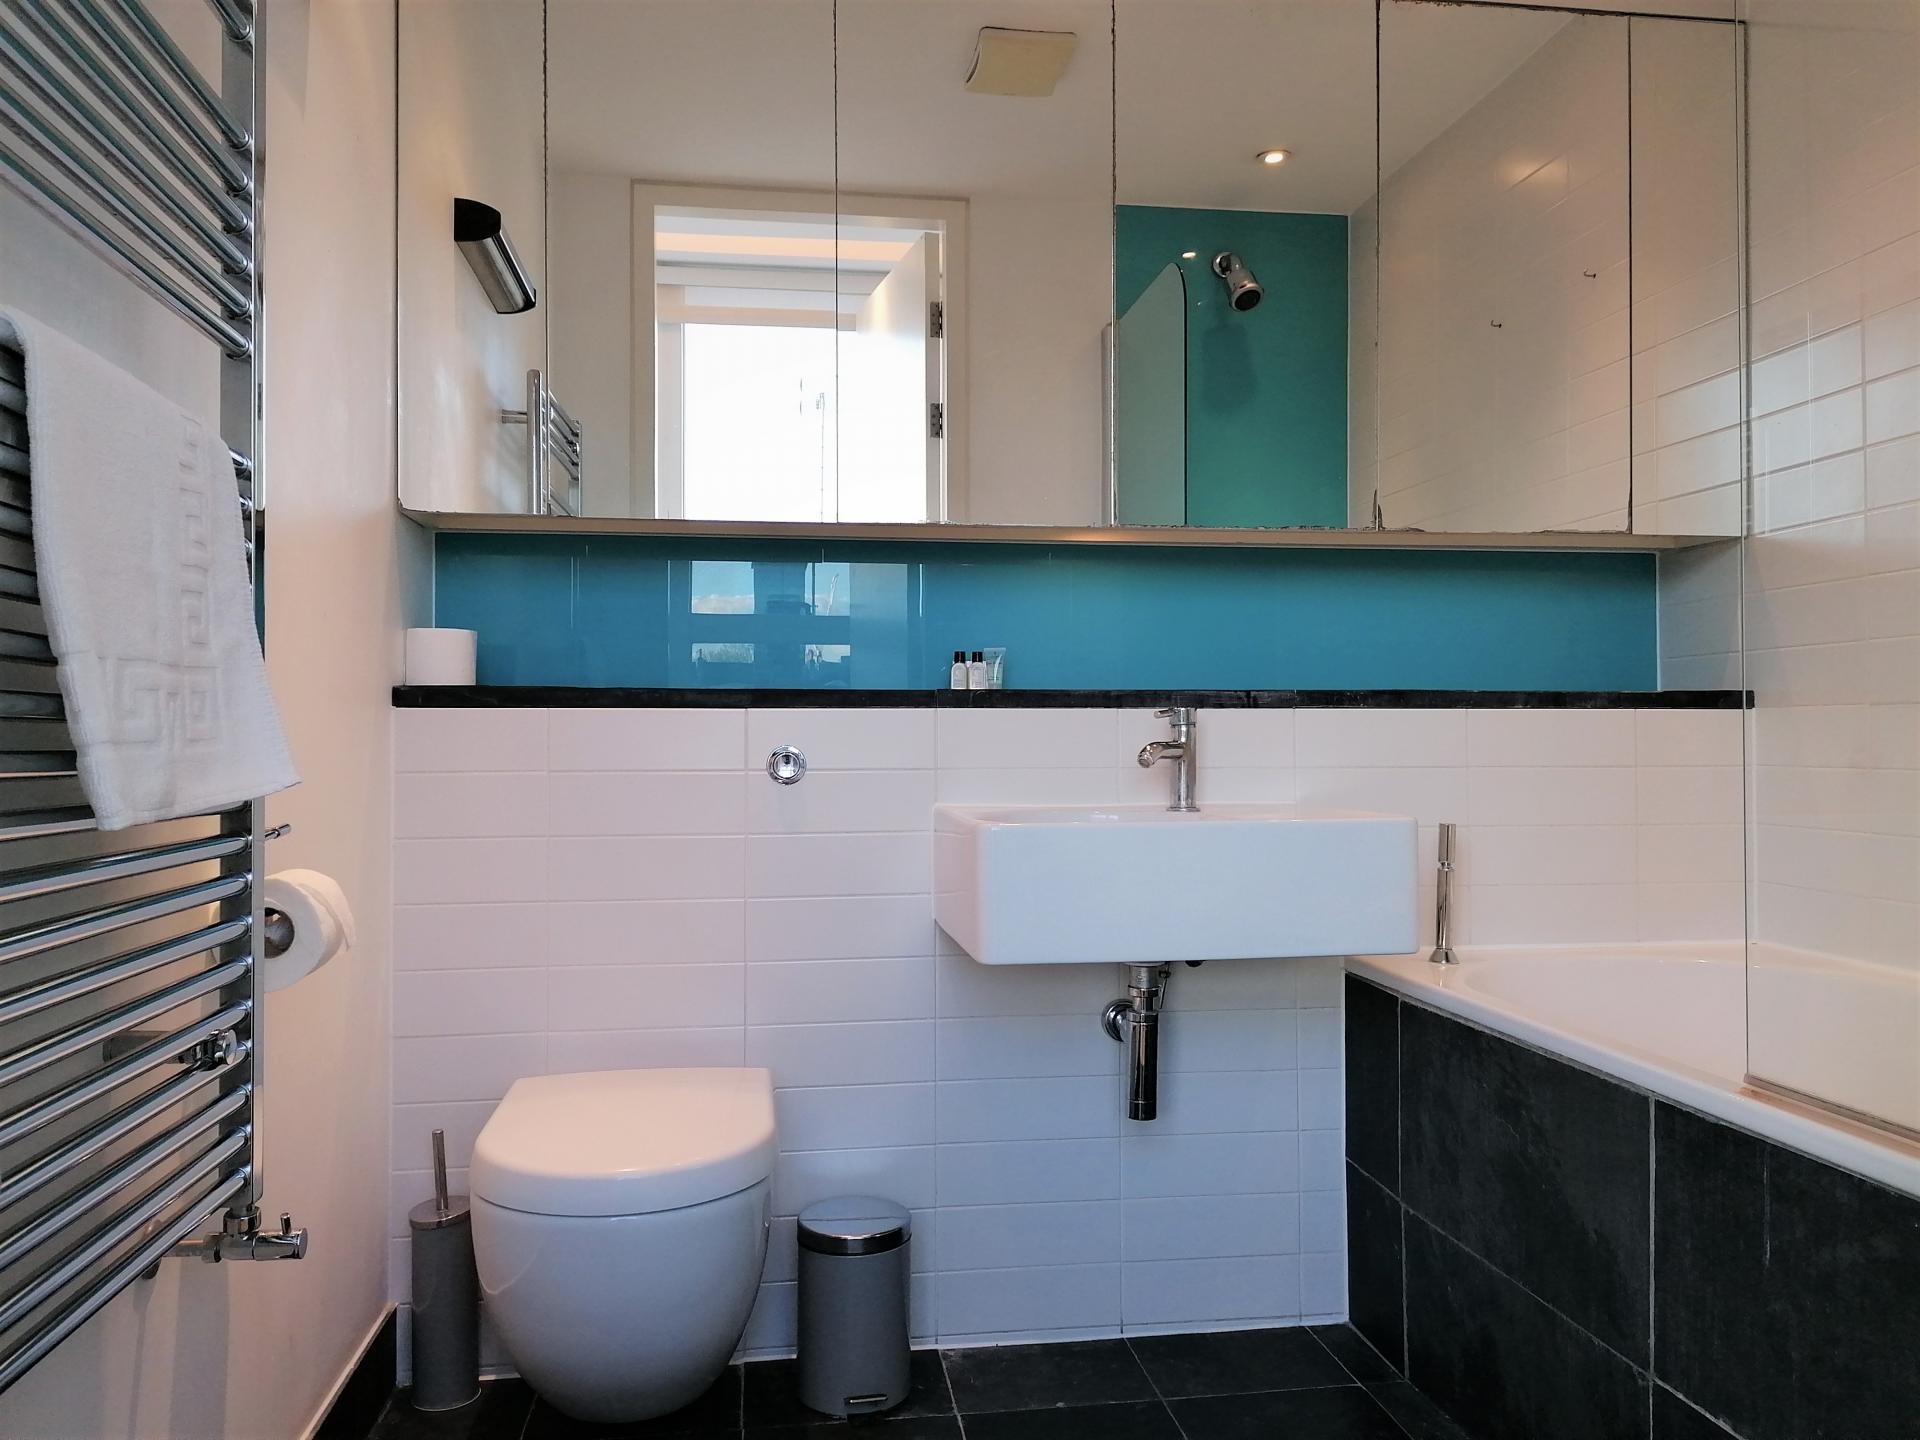 Bathroom at Still Life King's Cross Superior Apartment, Kings Cross St Pancras, London - Citybase Apartments